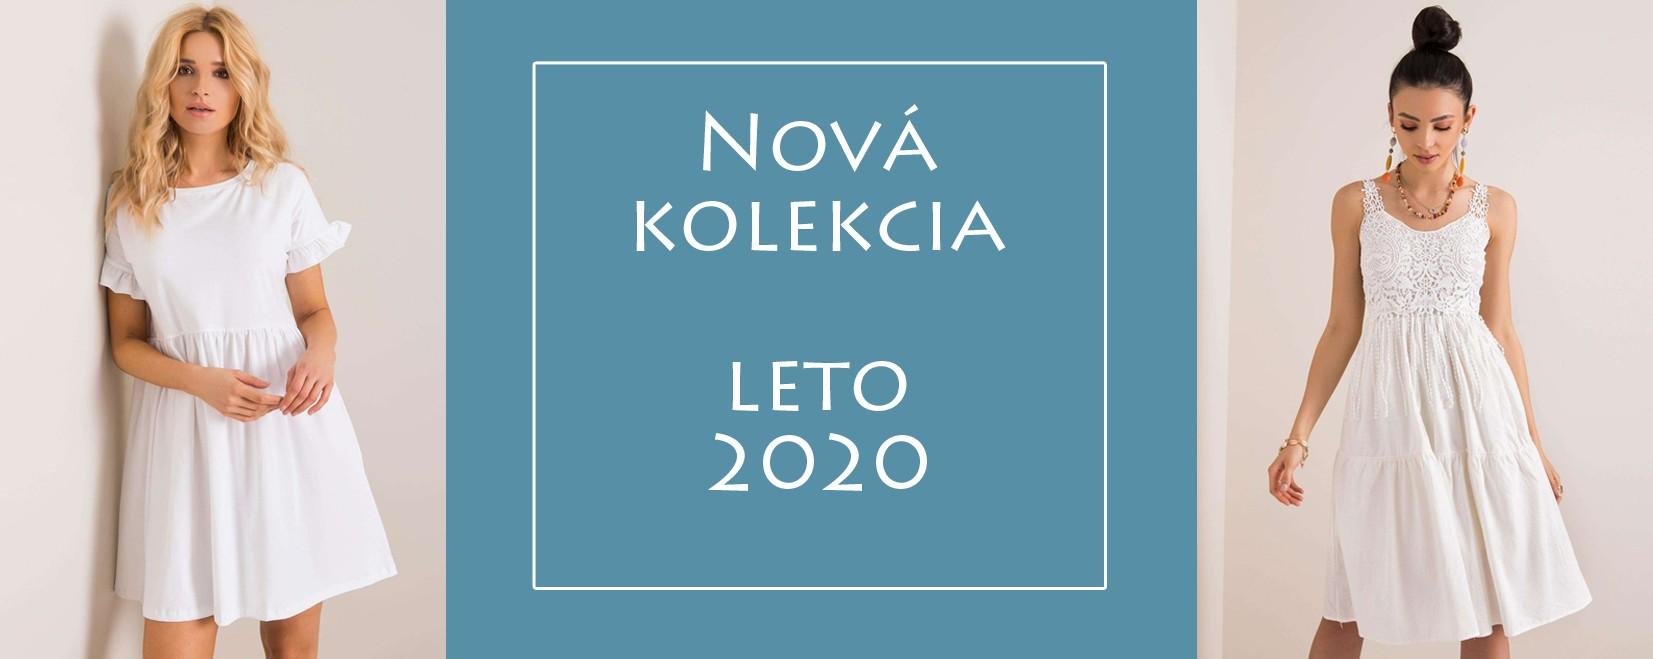 Nová kolekcia - leto 2020